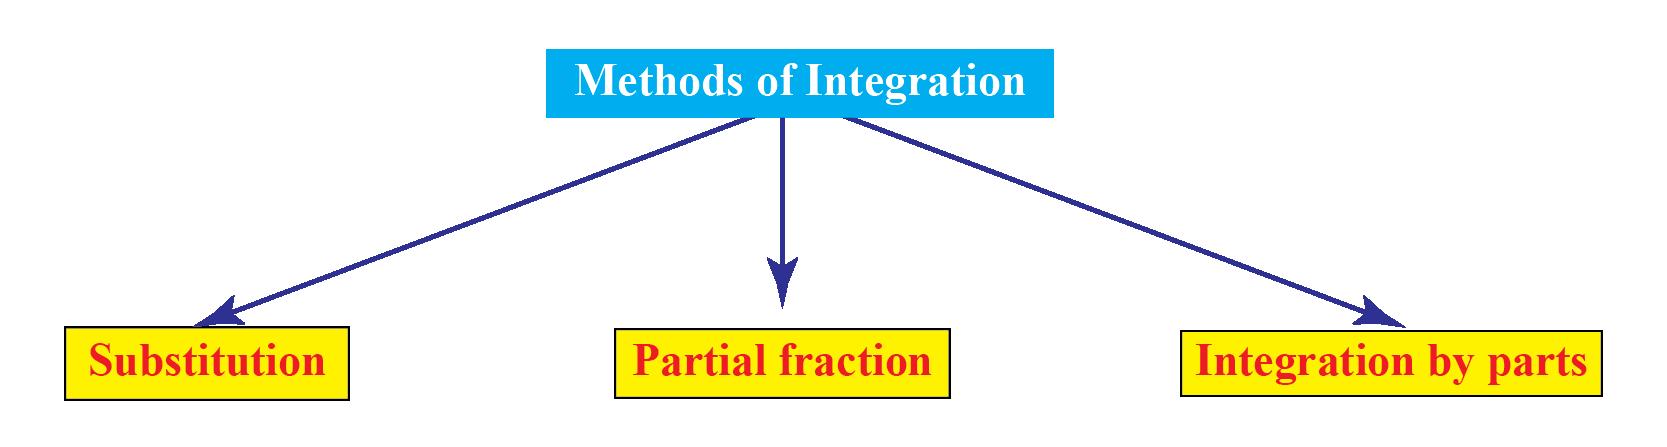 Different methods of integration